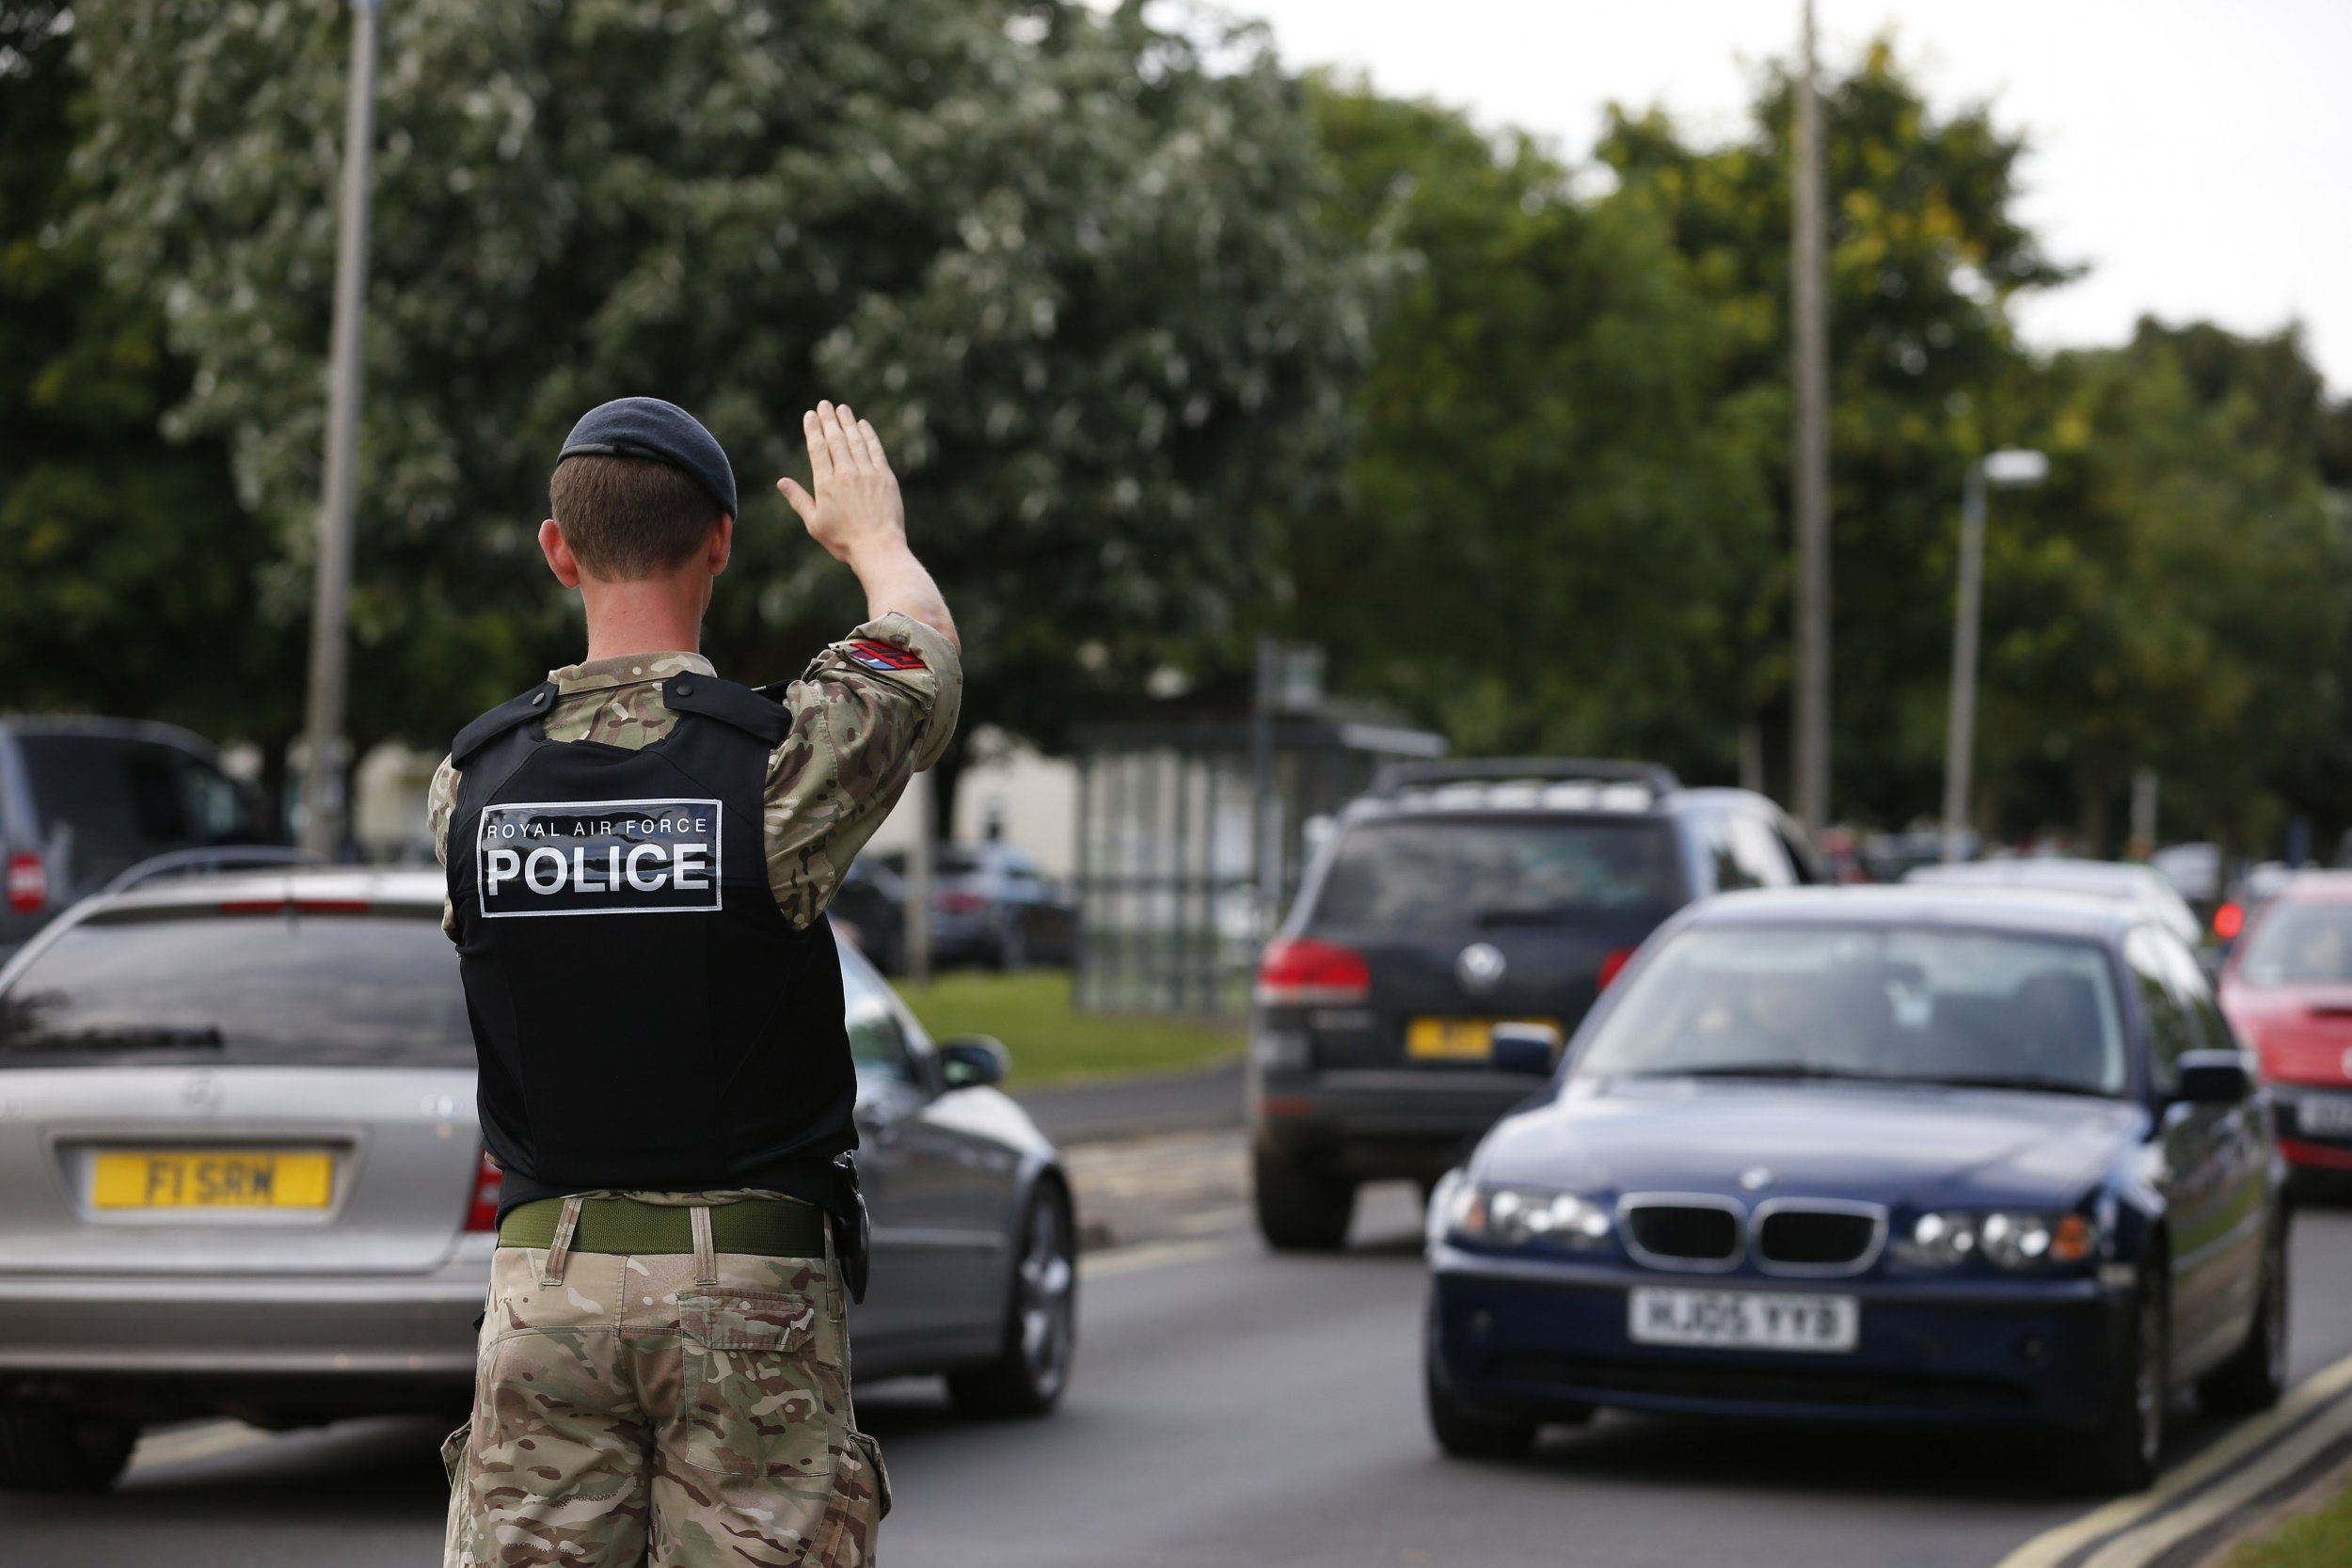 Marham Police